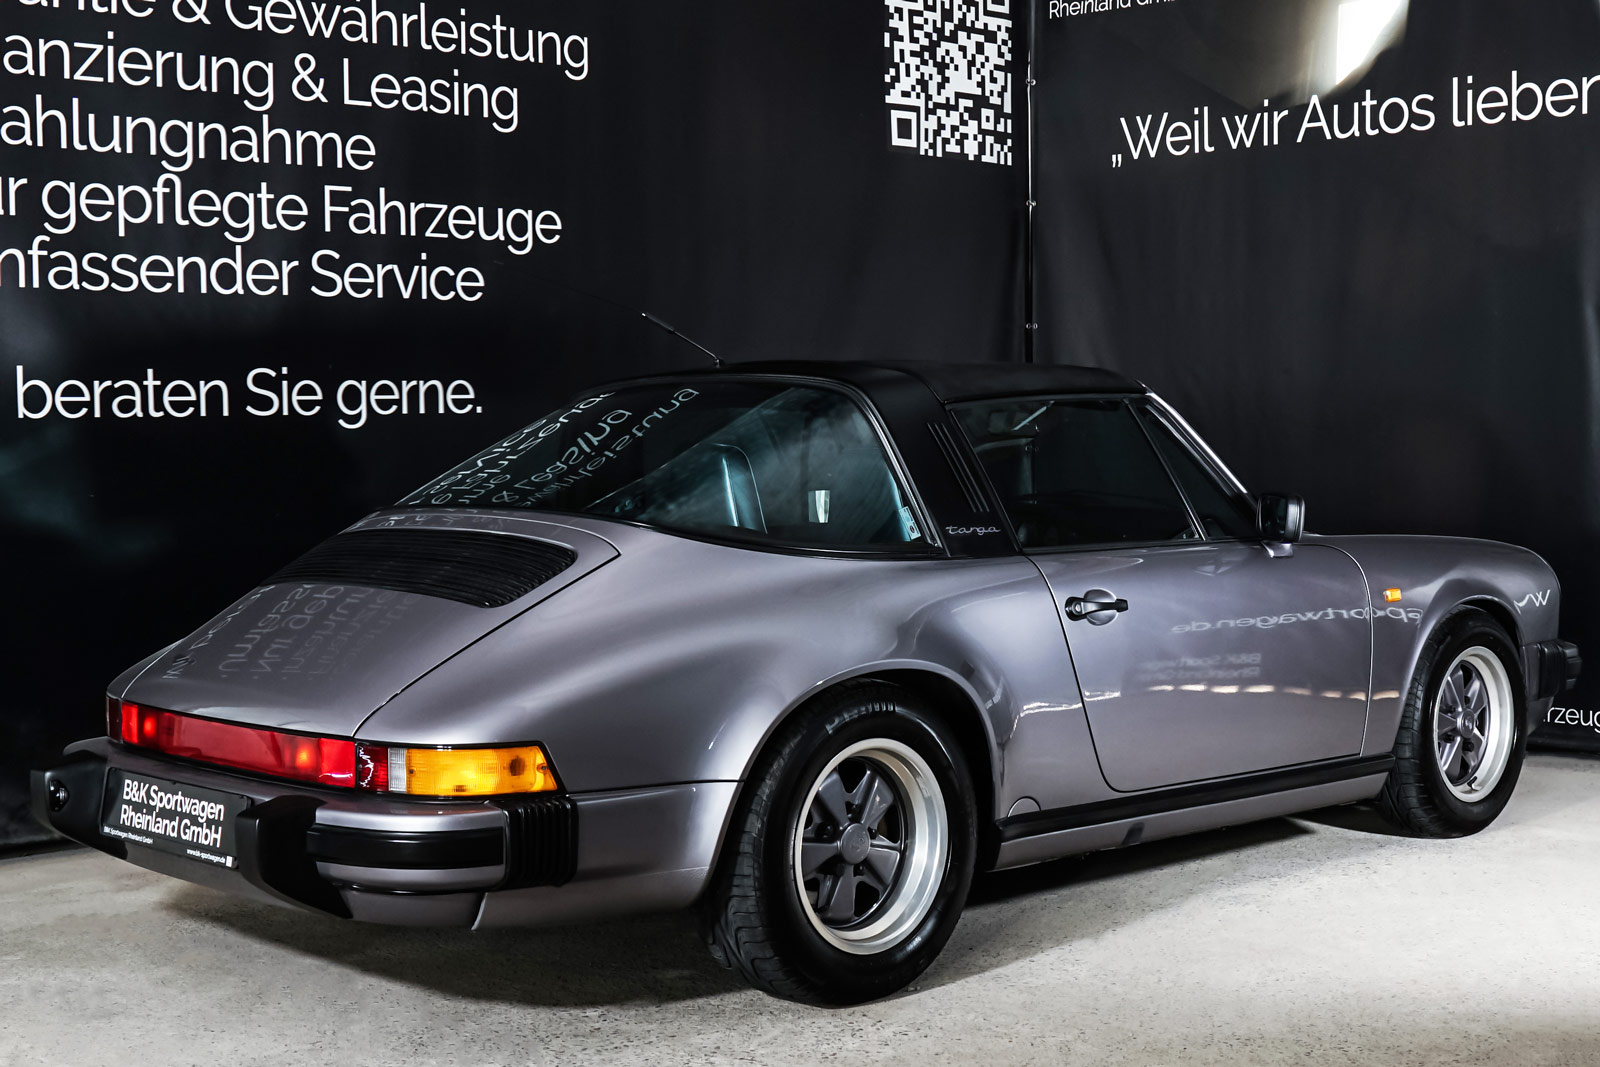 Porsche_911_Targa_Diamantblaumetallic_Blau_POR-0092_19_w